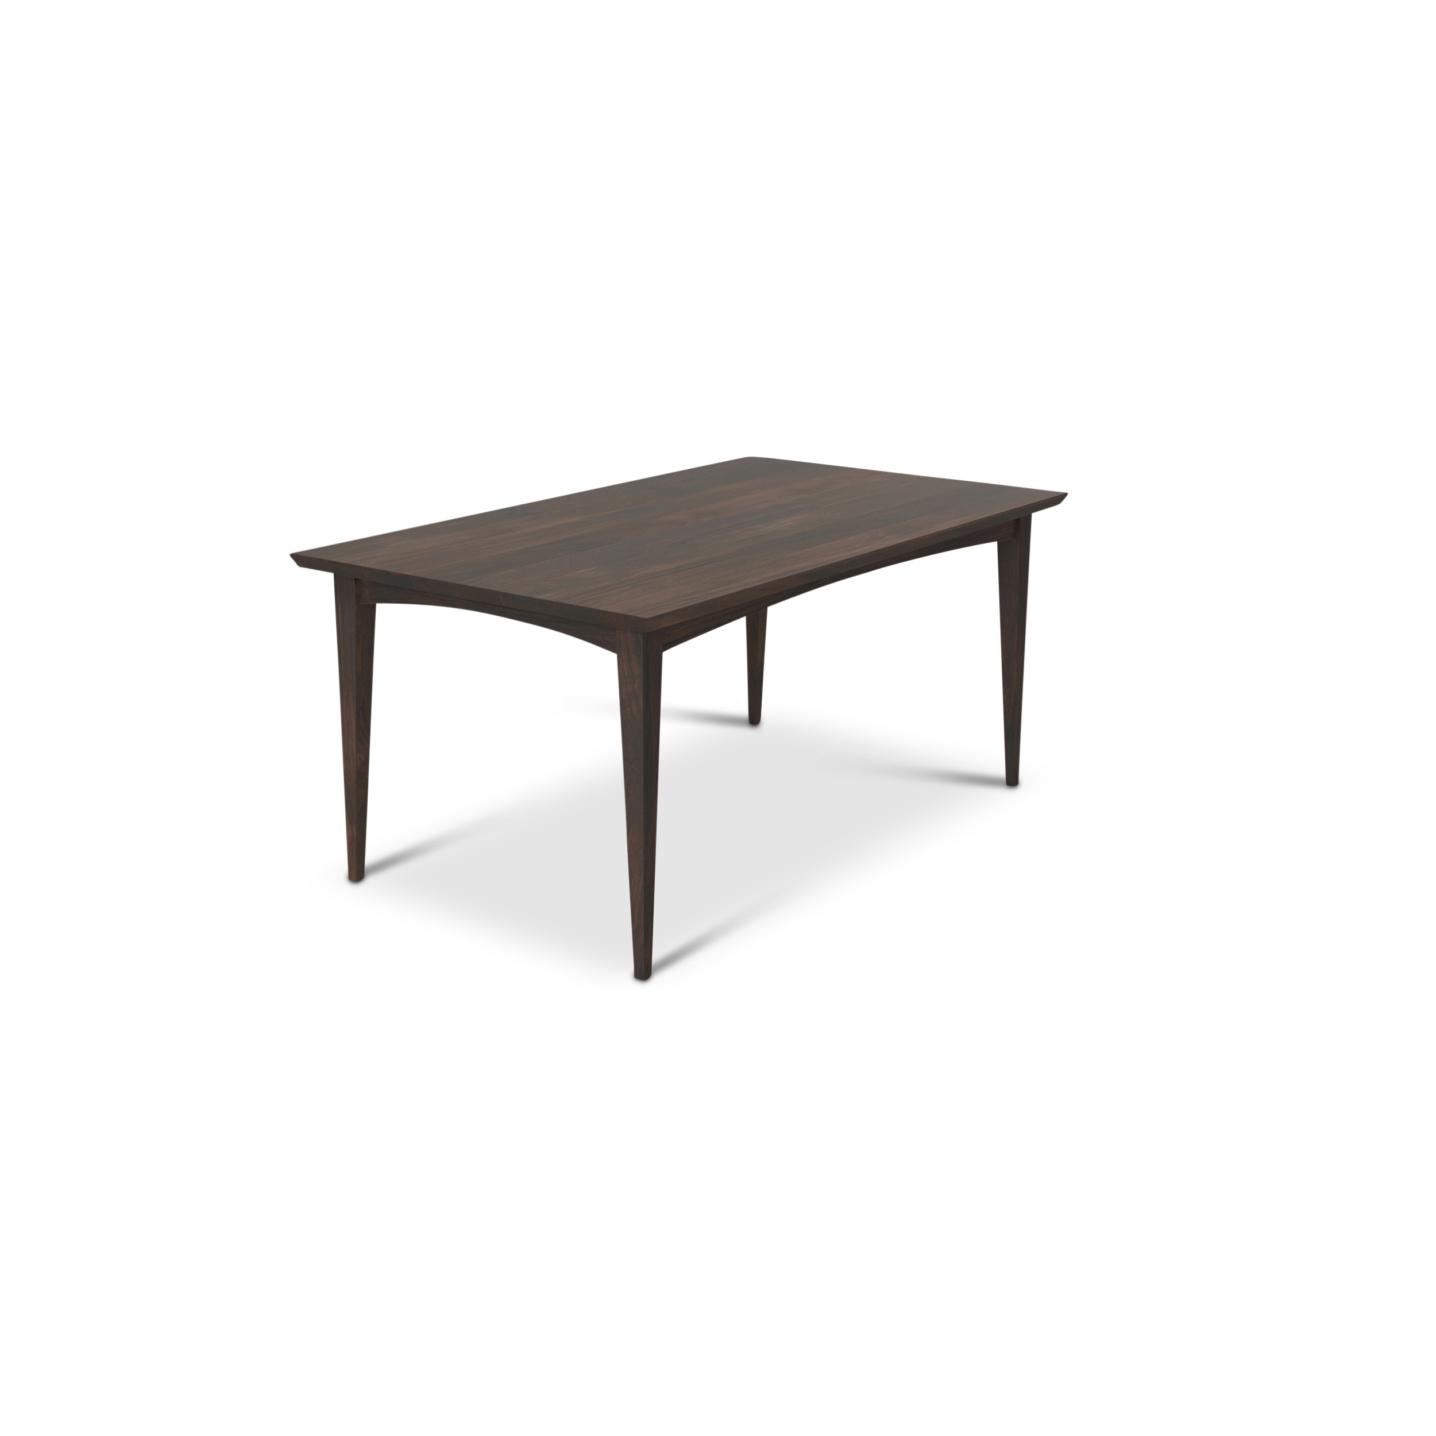 "Solid walnut 66"" mid-century modern table"